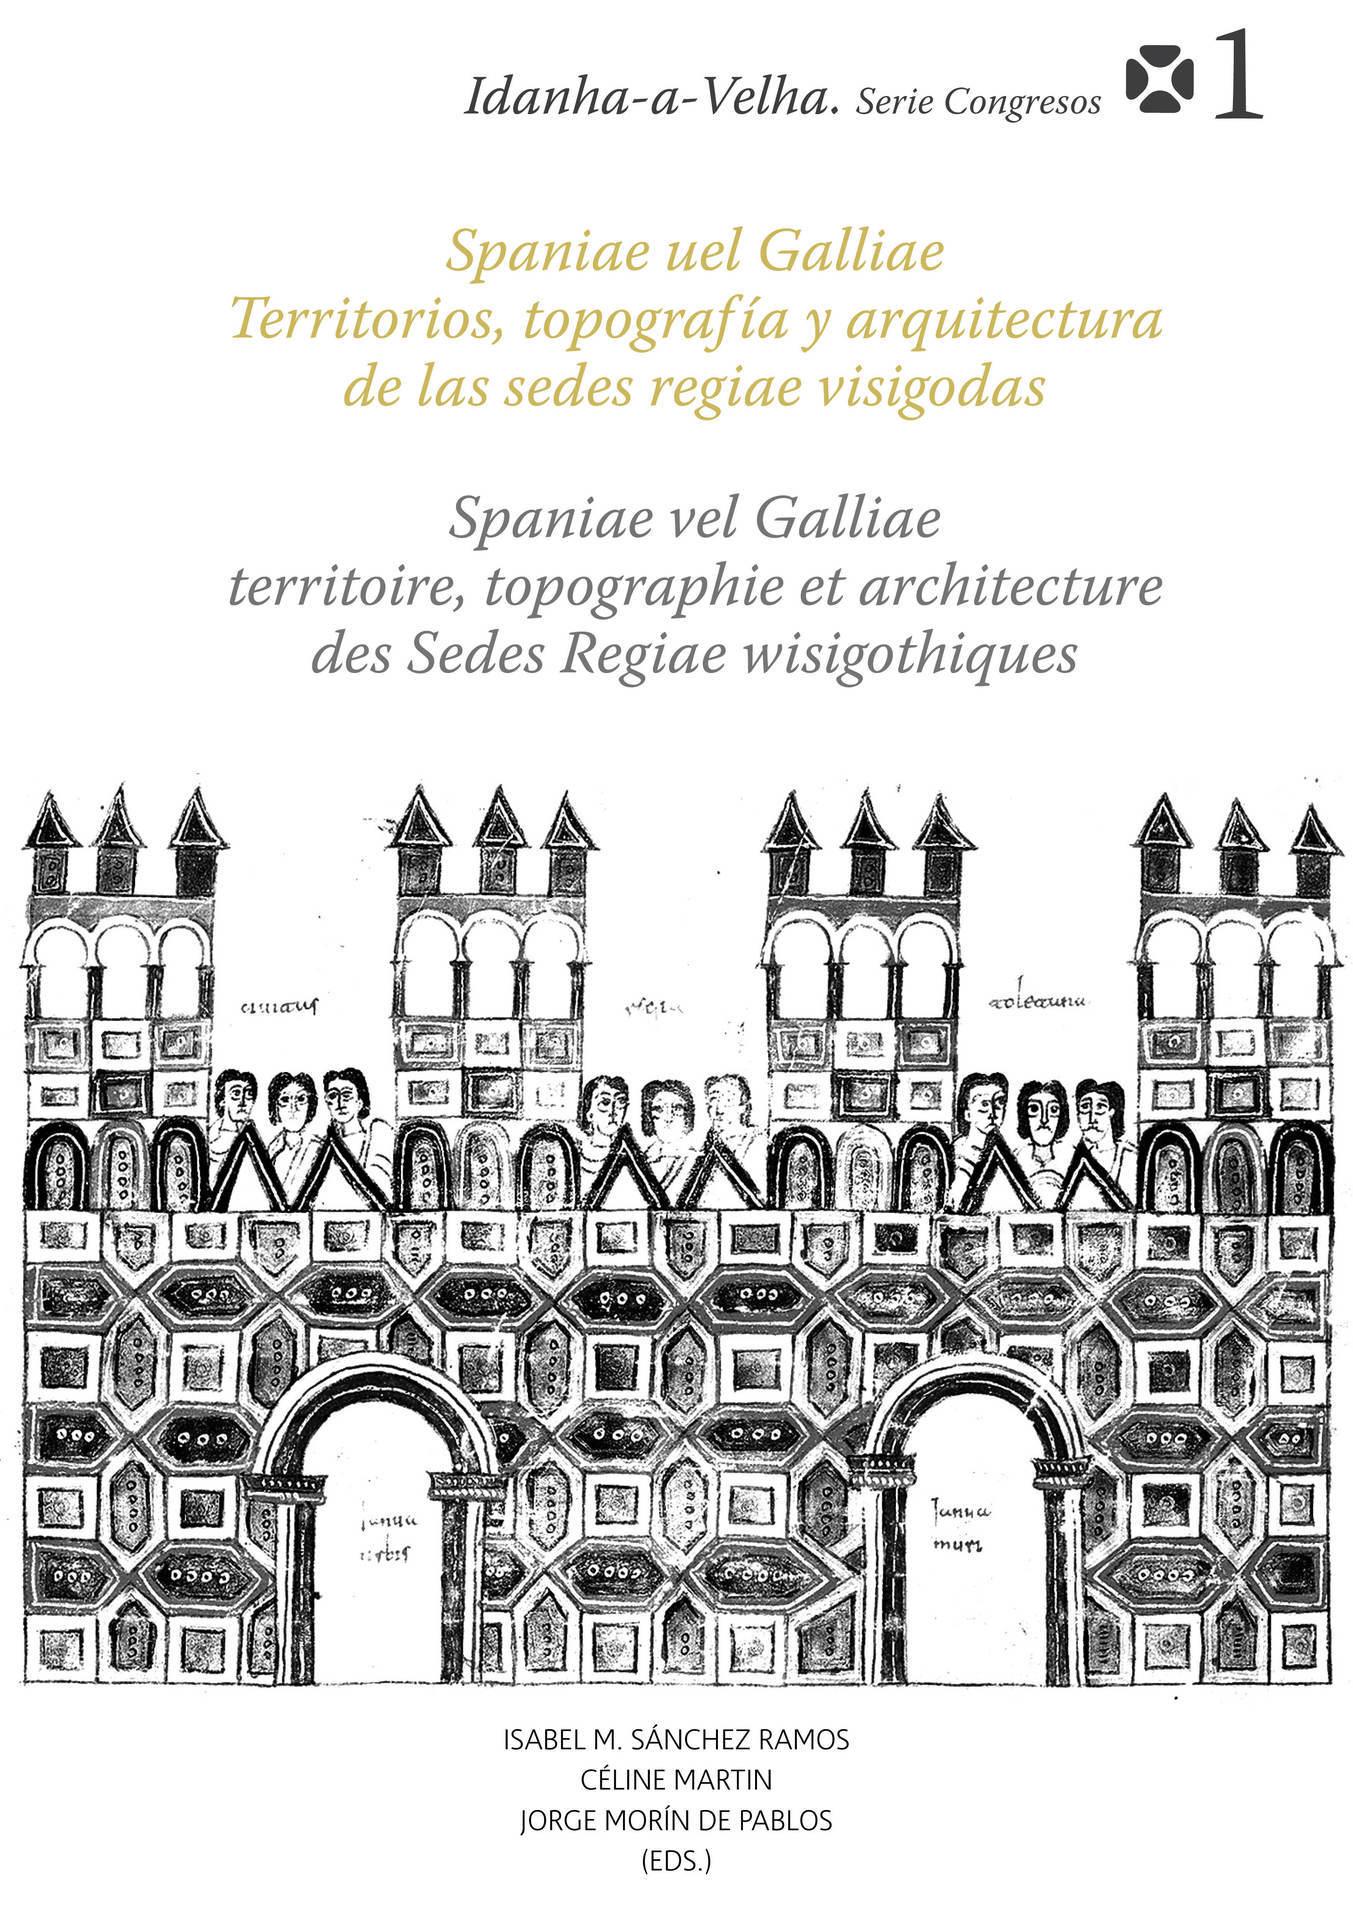 Spaniae uel Galliae. Territorios, topografía y arquitectura de las sedes regiae visigodas Book Cover